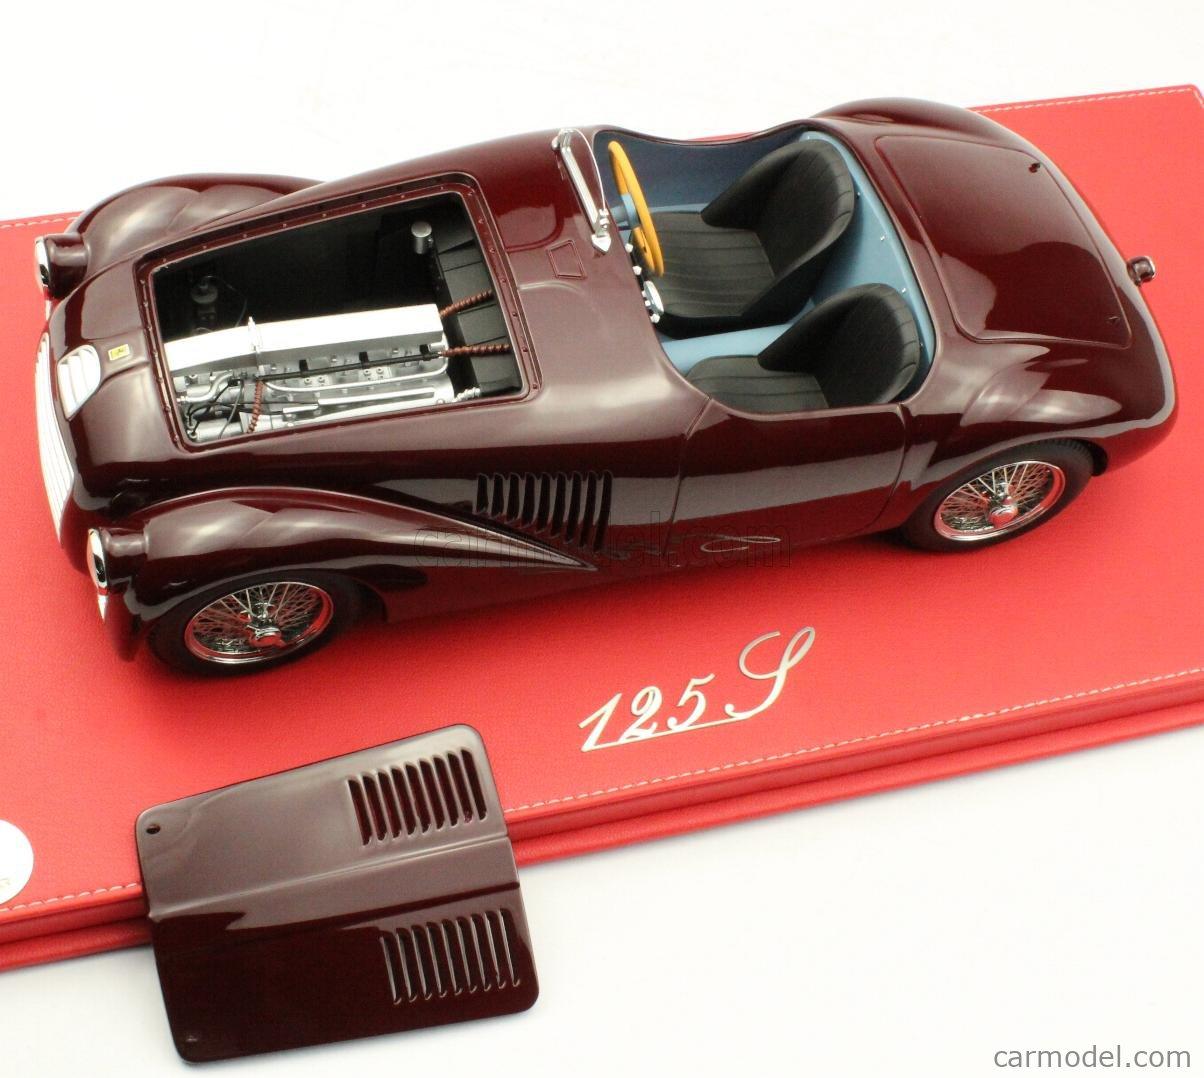 Modelcarswholesale F125bor Masstab 1 12 Ferrari 125s 1947 With Openable Front Bonnet Bordeaux